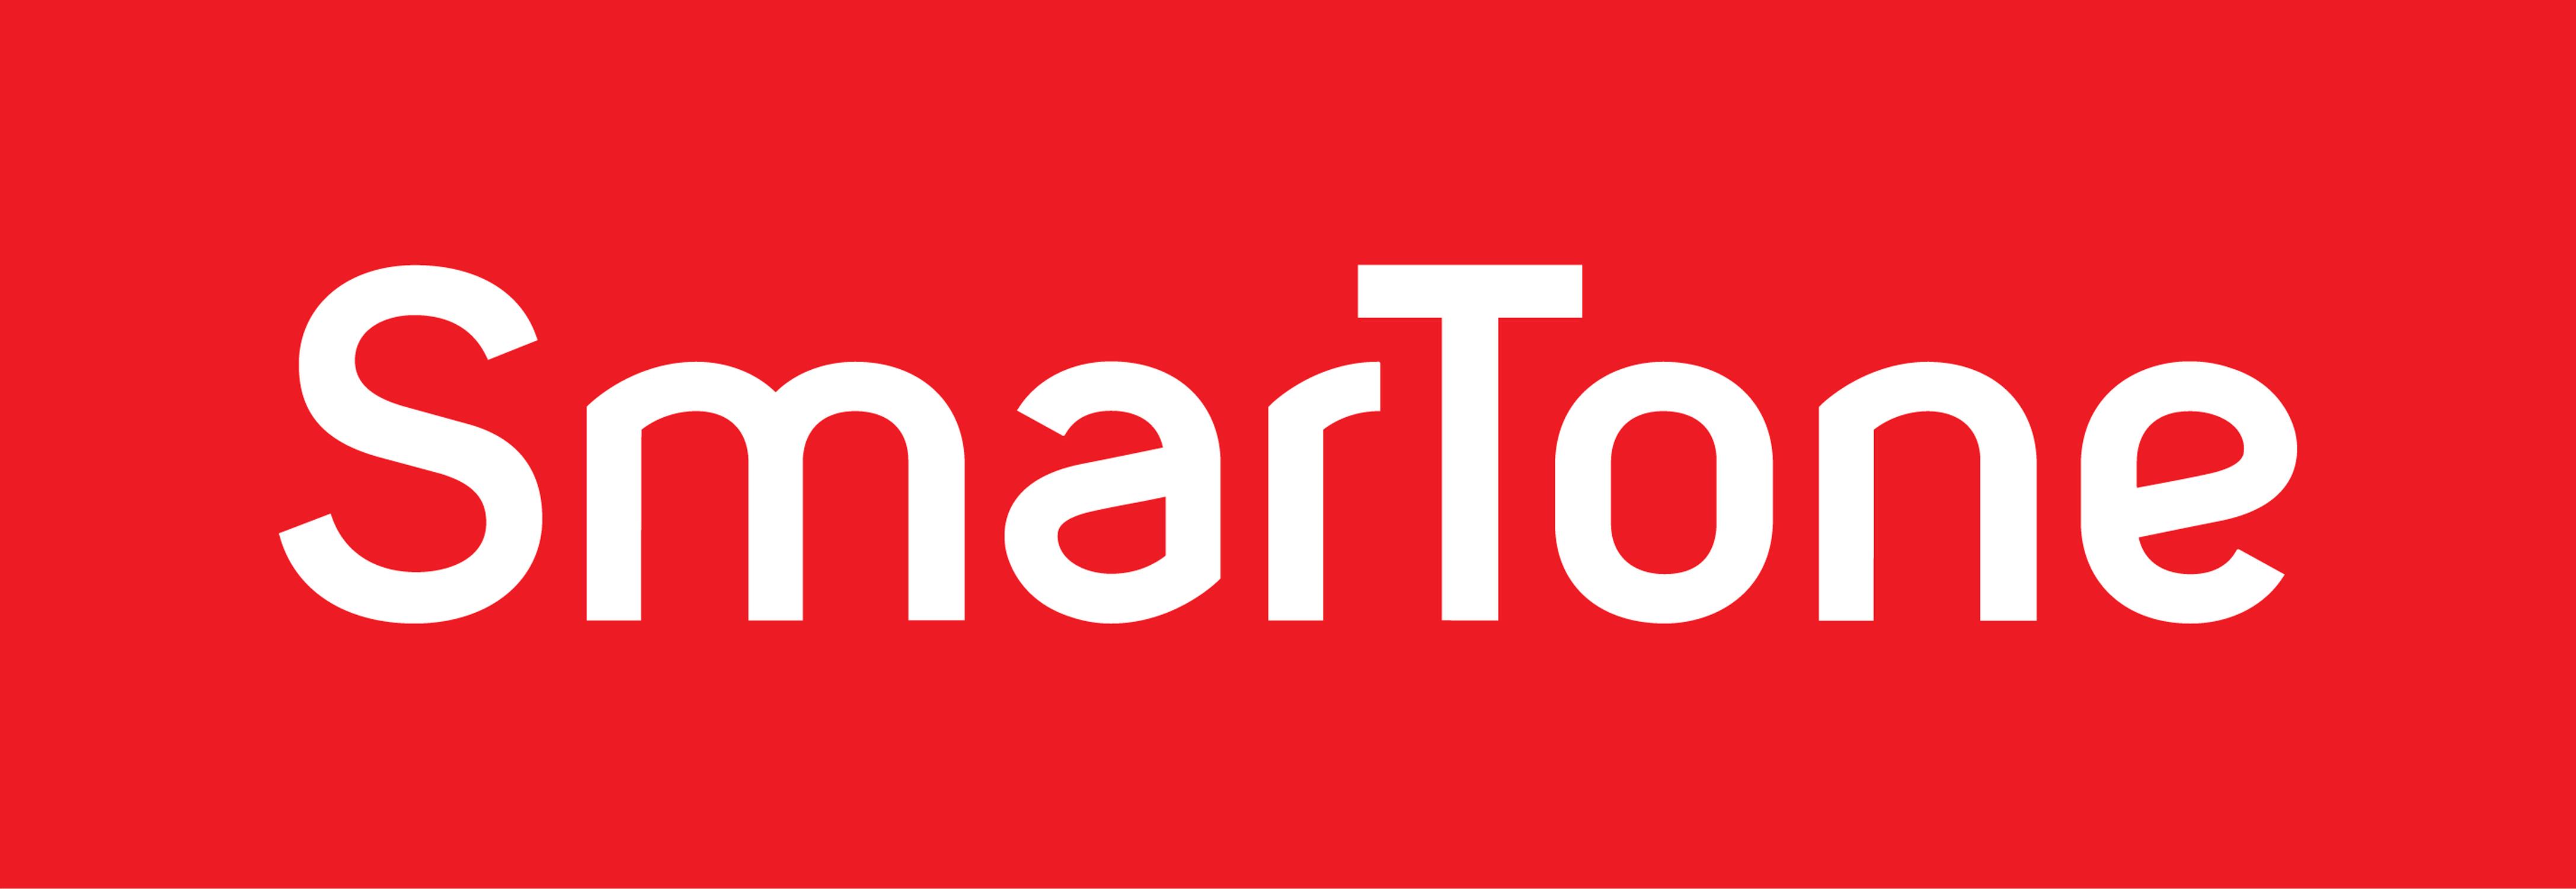 SmarTone 疑全港多區信號現故障!重開手機可解決(14:54 更新:附官方回應) - 香港 unwire.hk